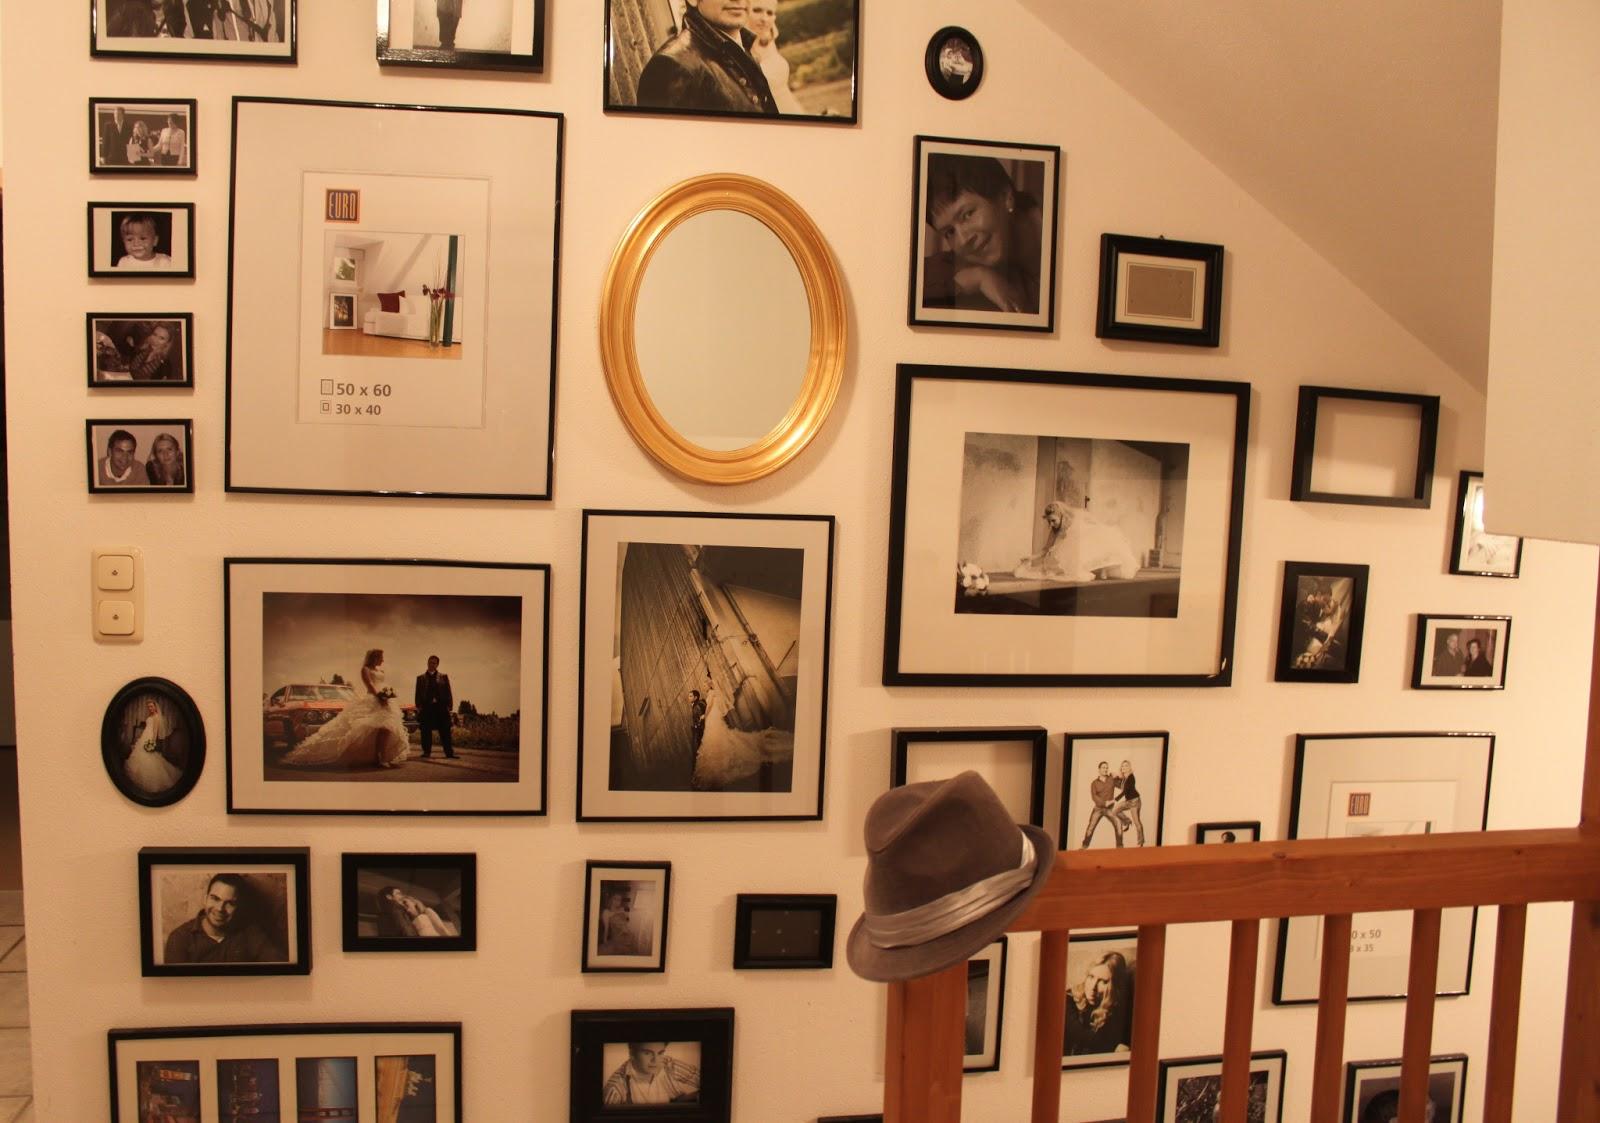 Meine Lieblings-Wohnidee: Dekorative Fotowand gestalten